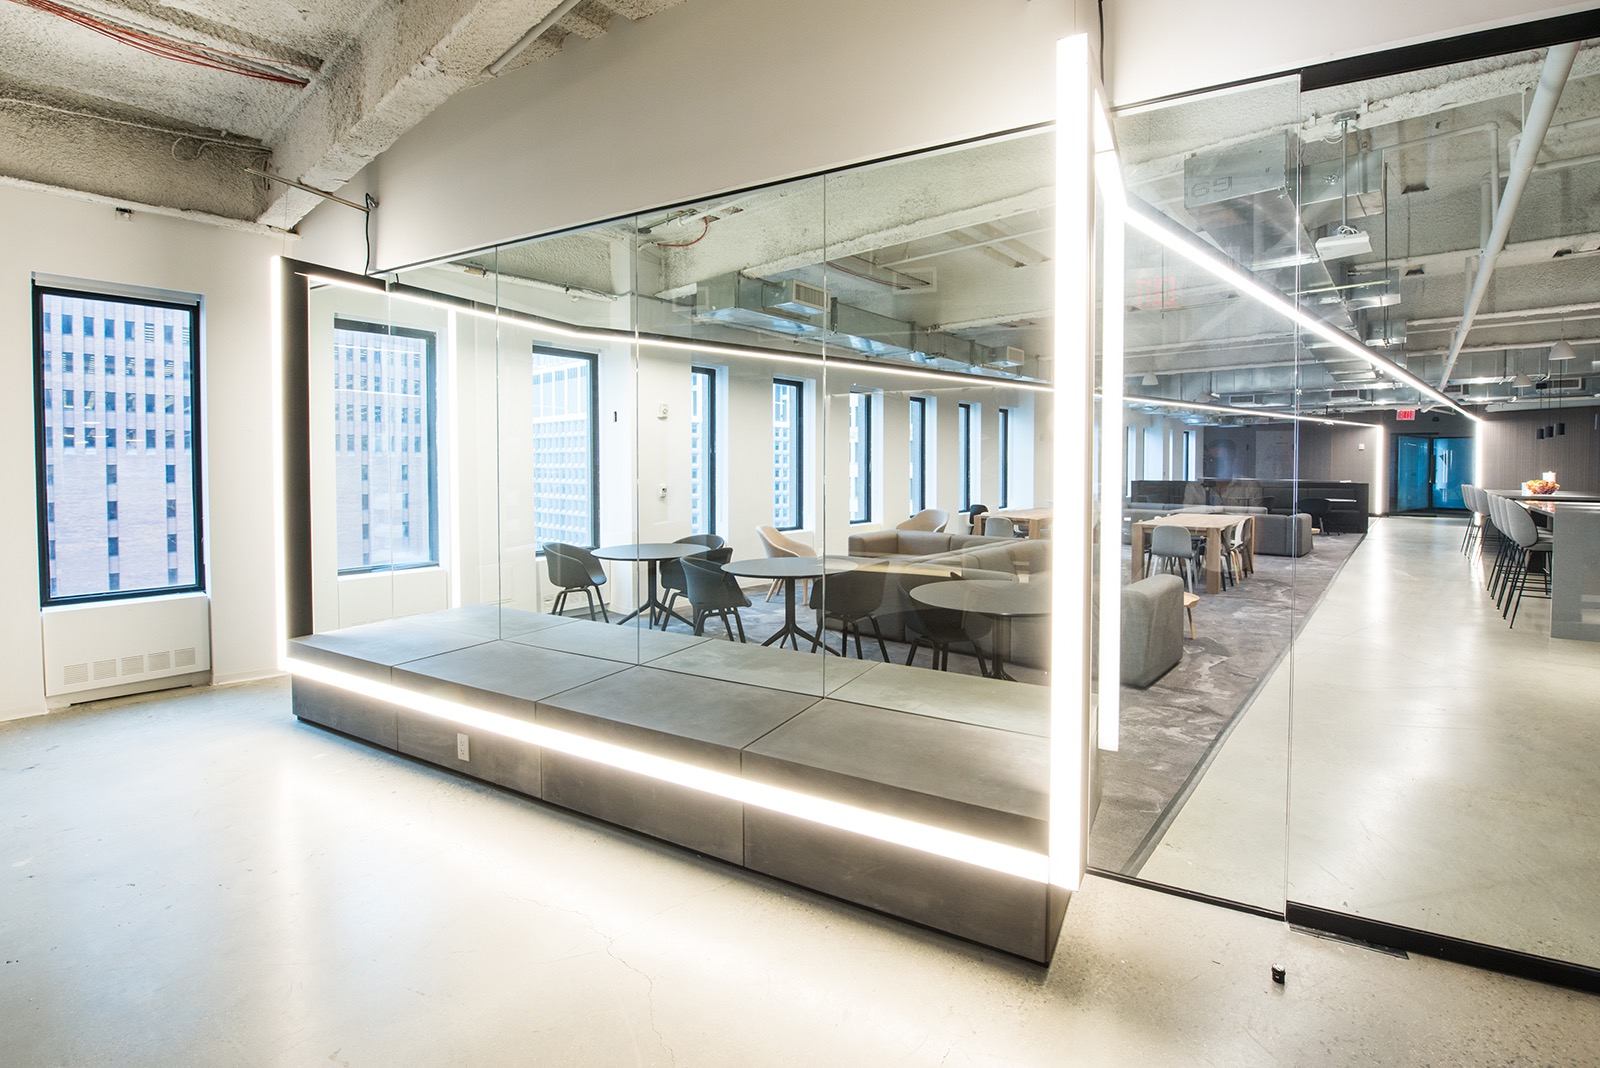 vox-media-nyc-office-4